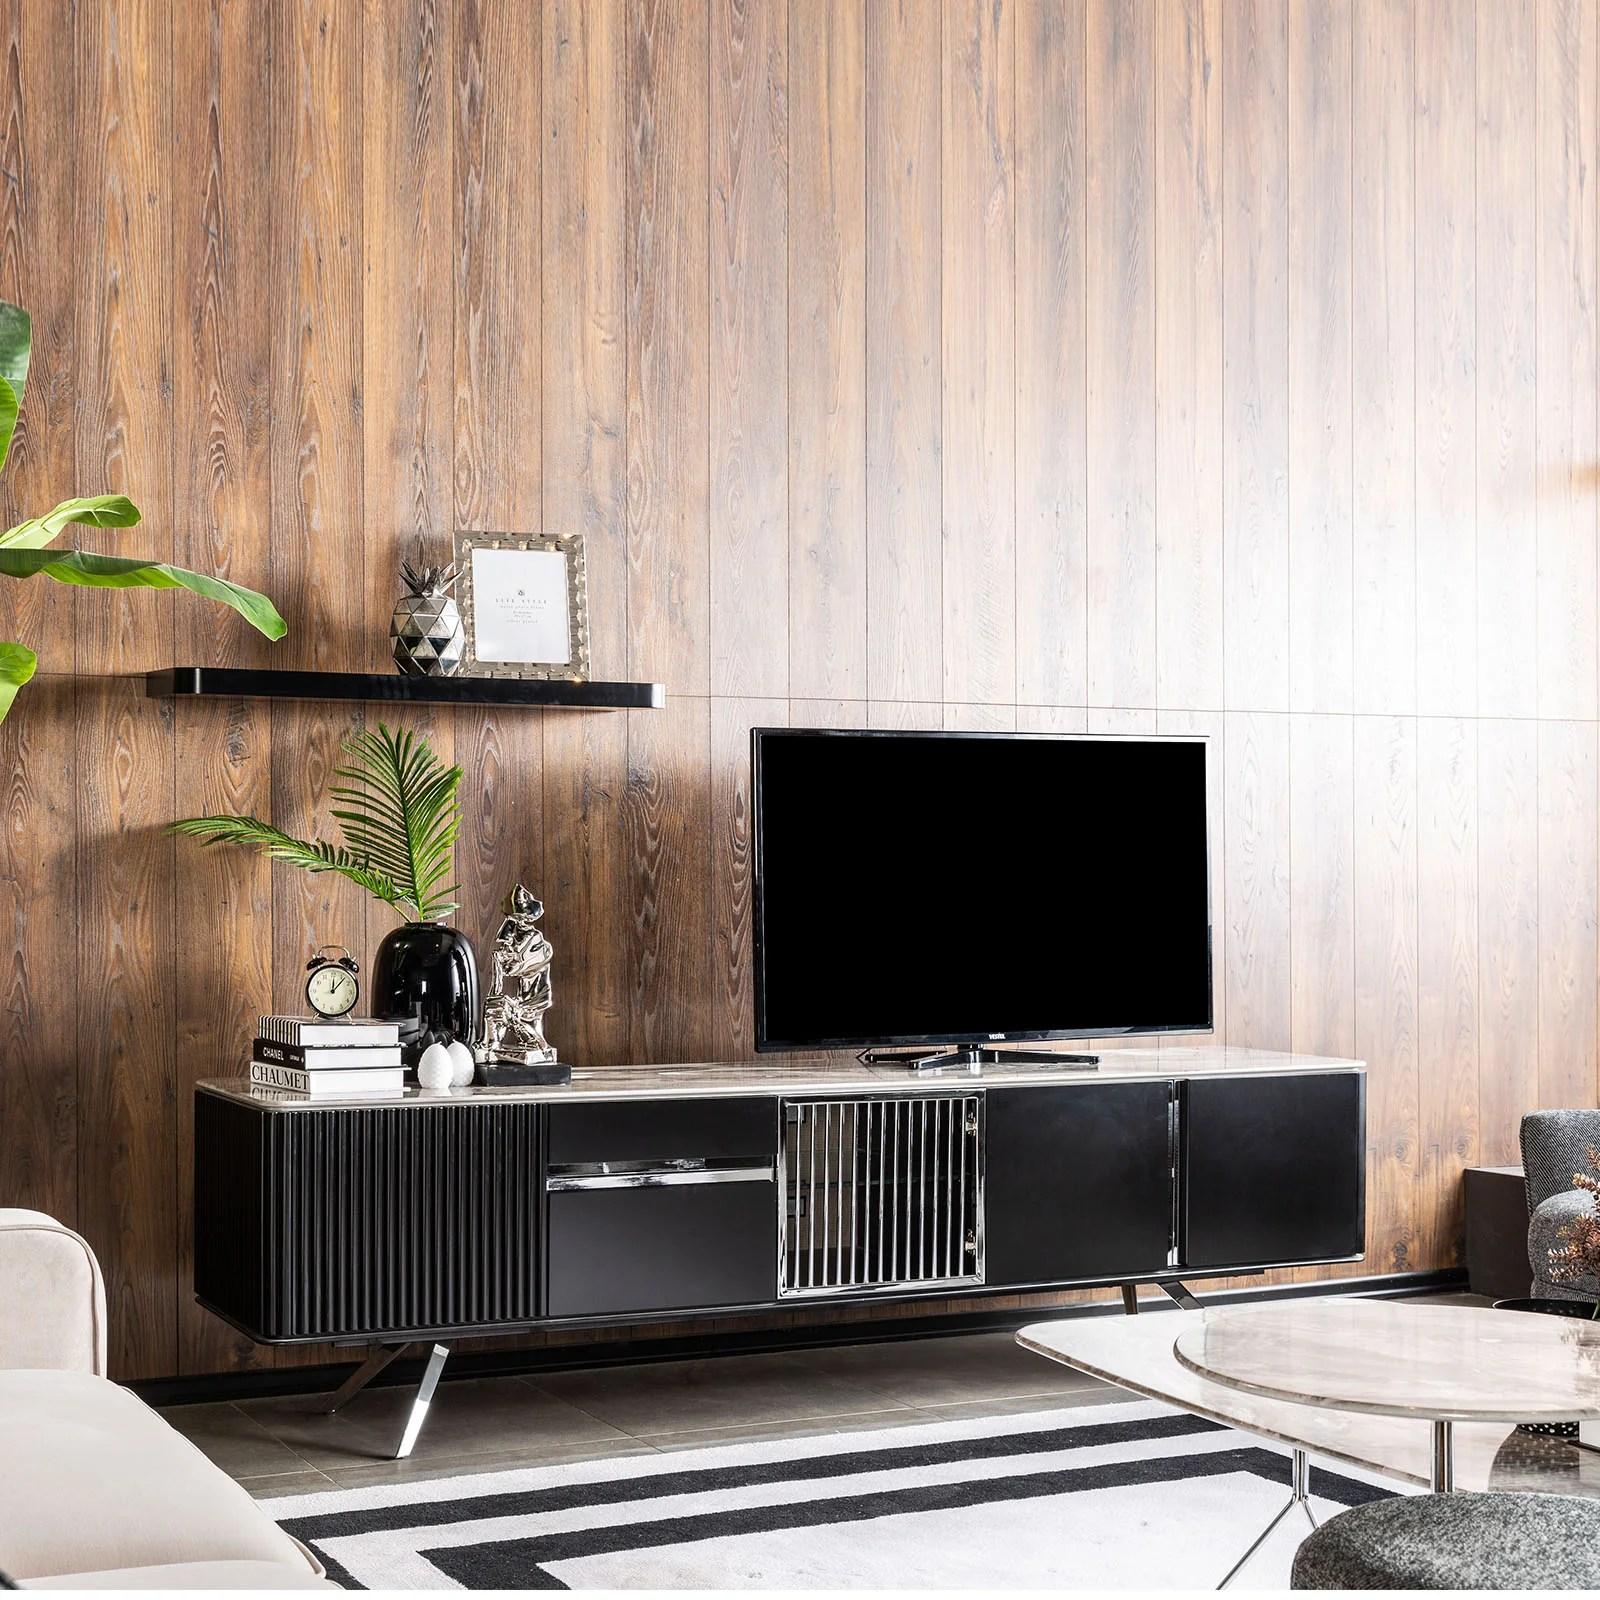 BERETTA TV unit BER00005 | Online Furniture & Home Decor UAE on Beretta Outdoor Living id=46566